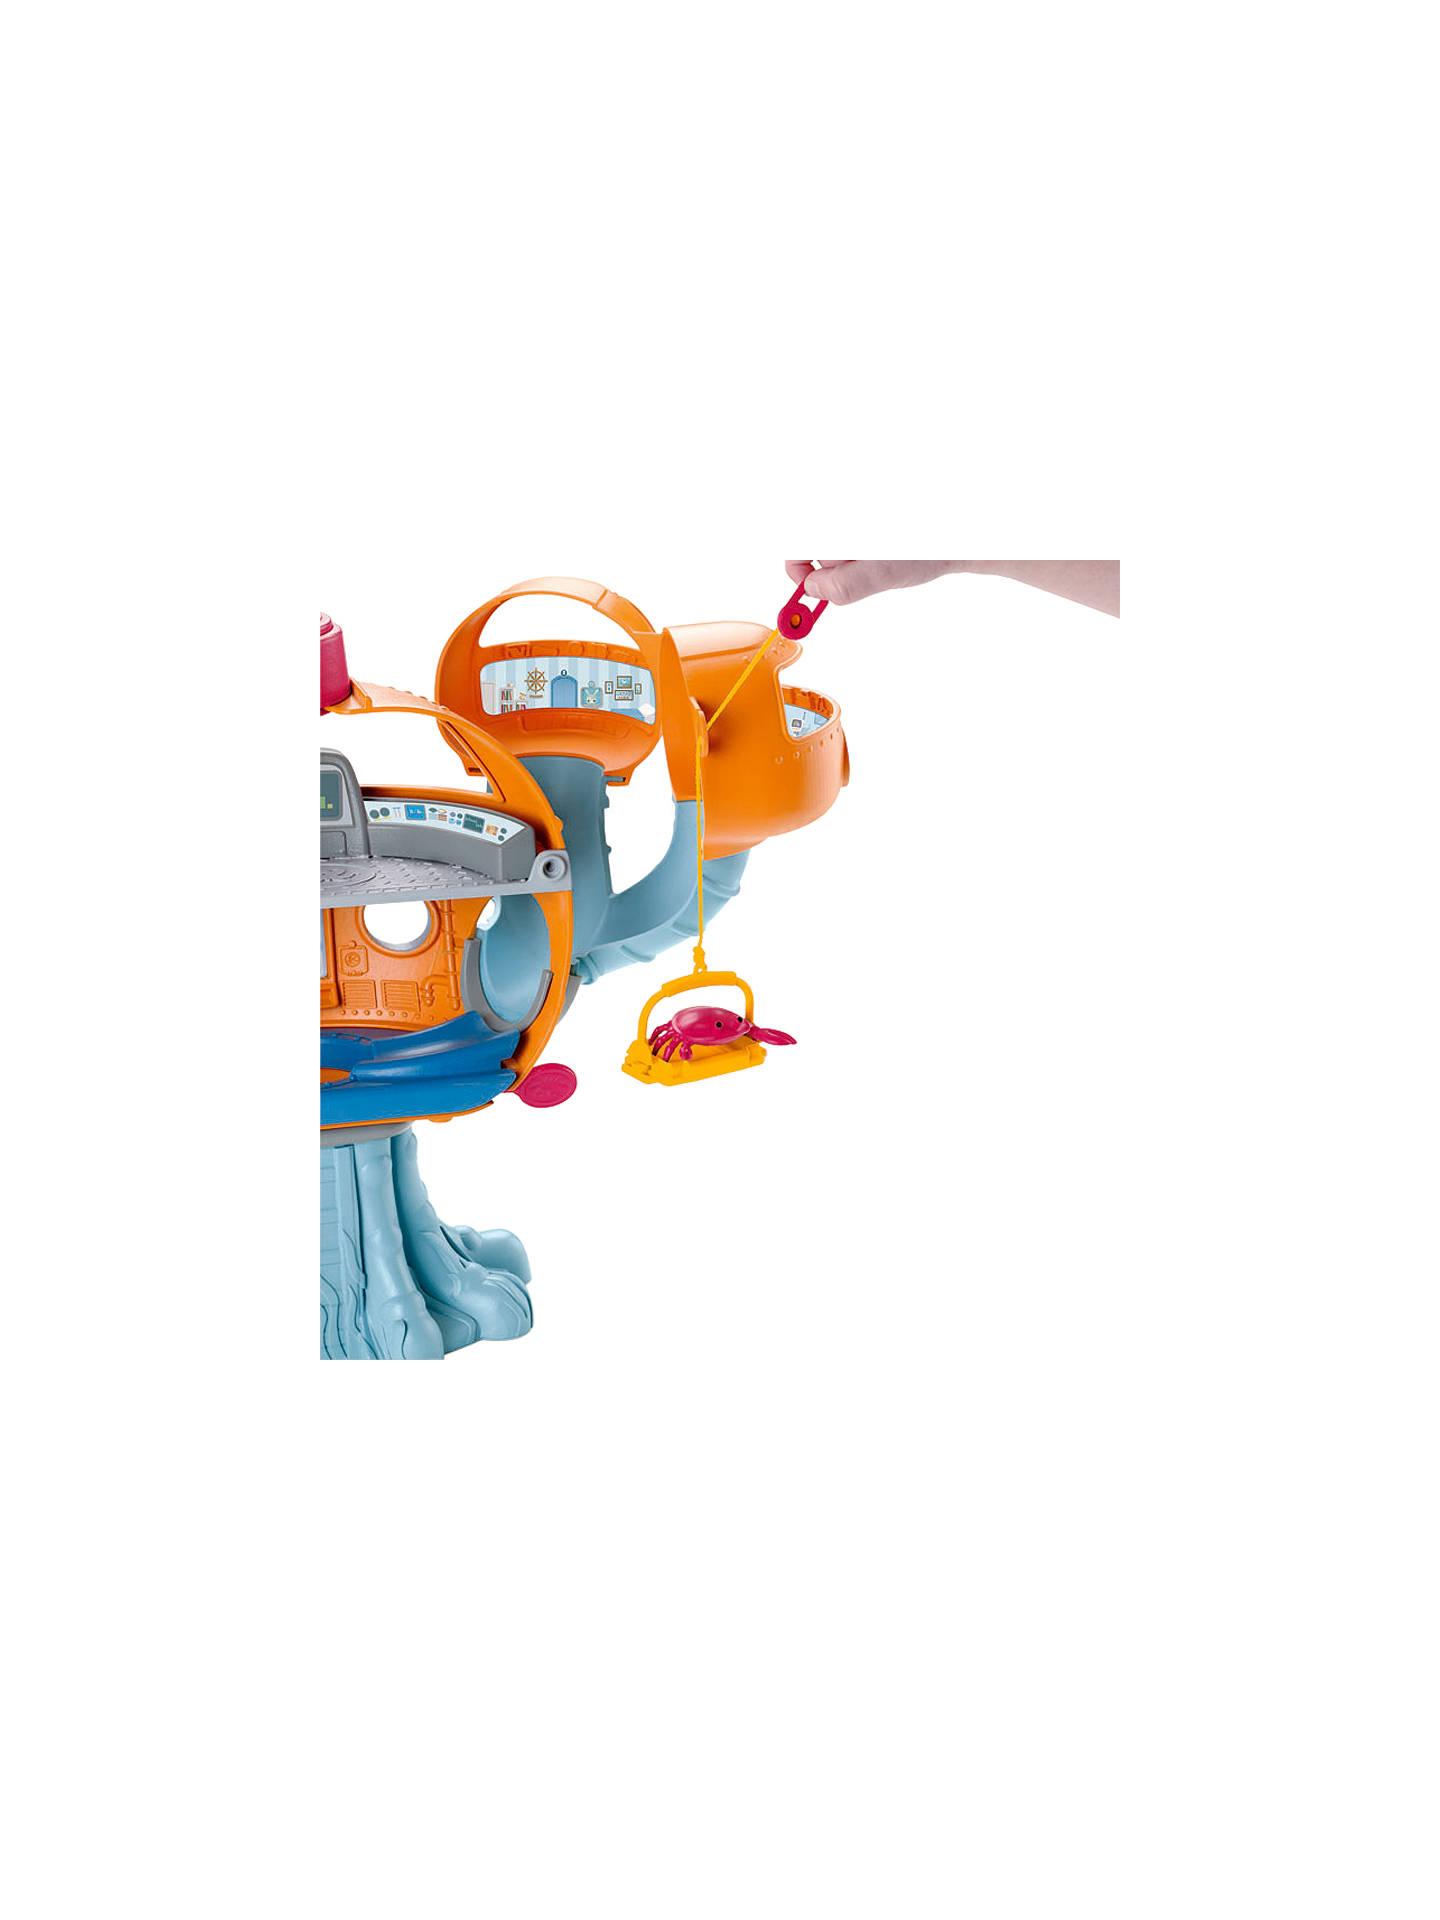 Fisher-Price Octonauts Octopod Playset at John Lewis & Partners